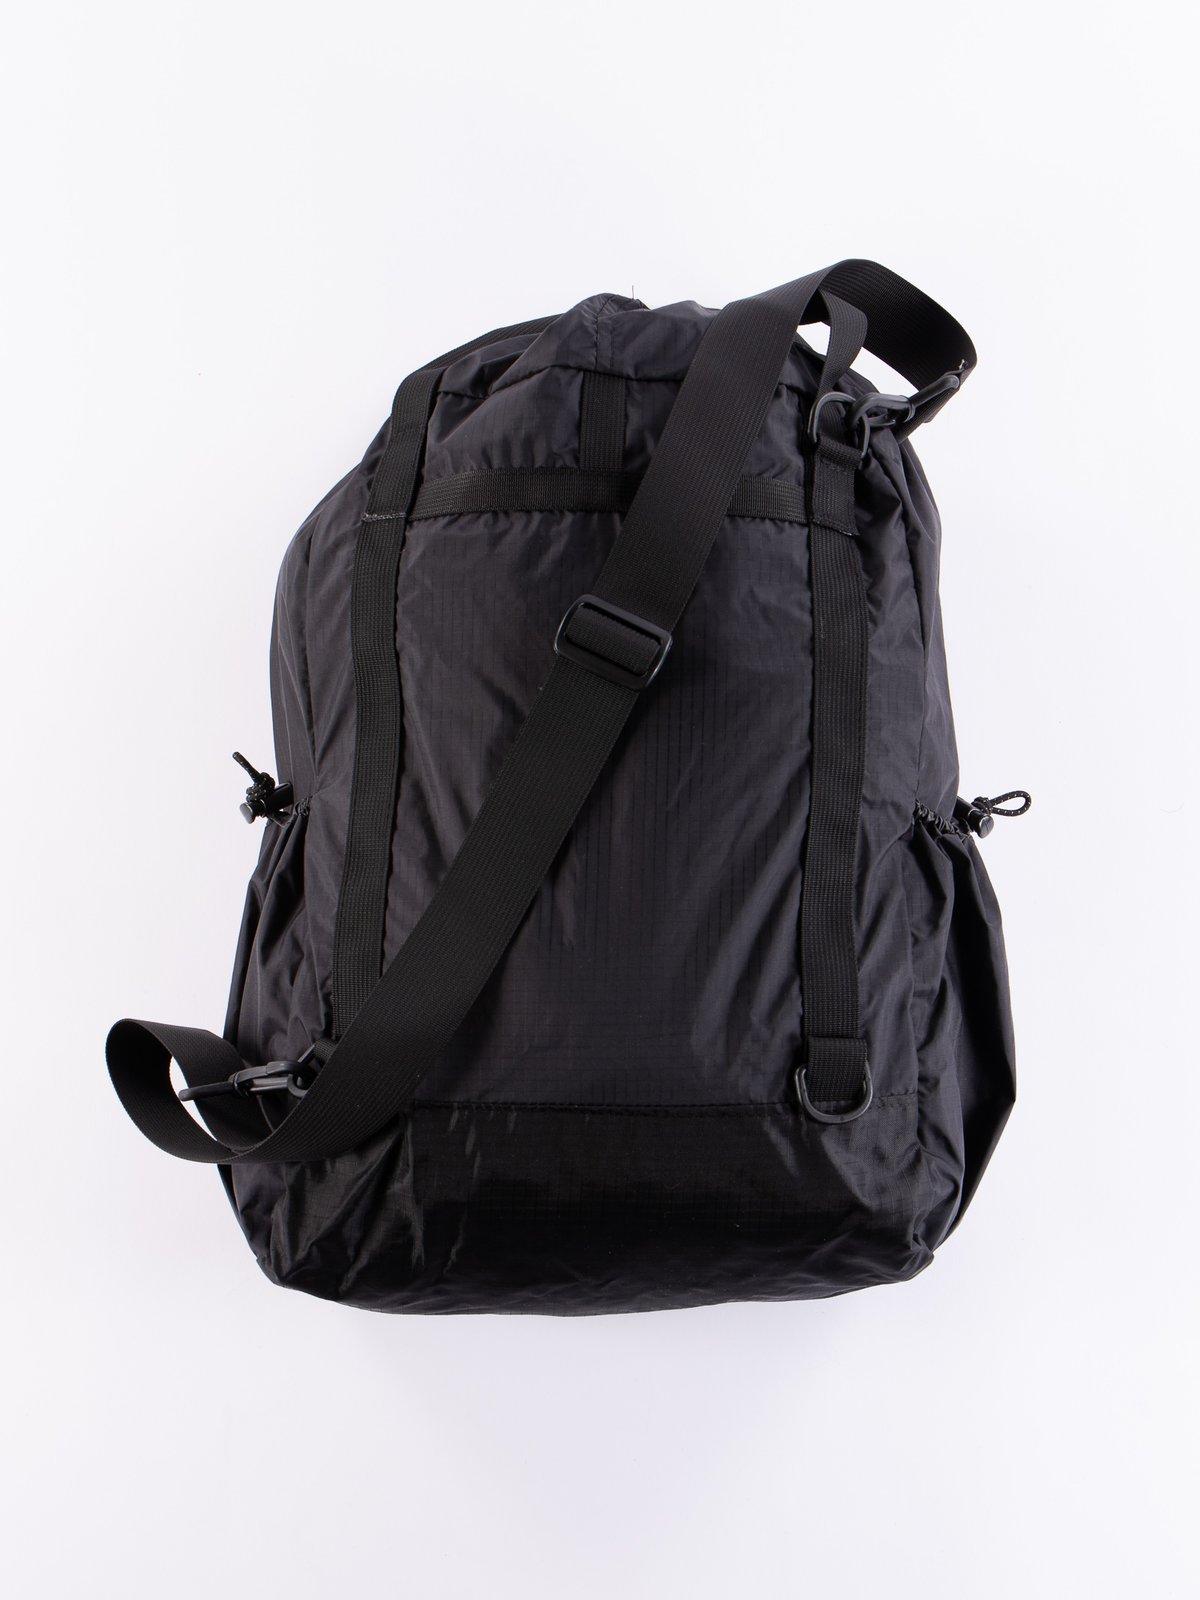 Black Nylon Ripstop UL 3 Way Bag - Image 3